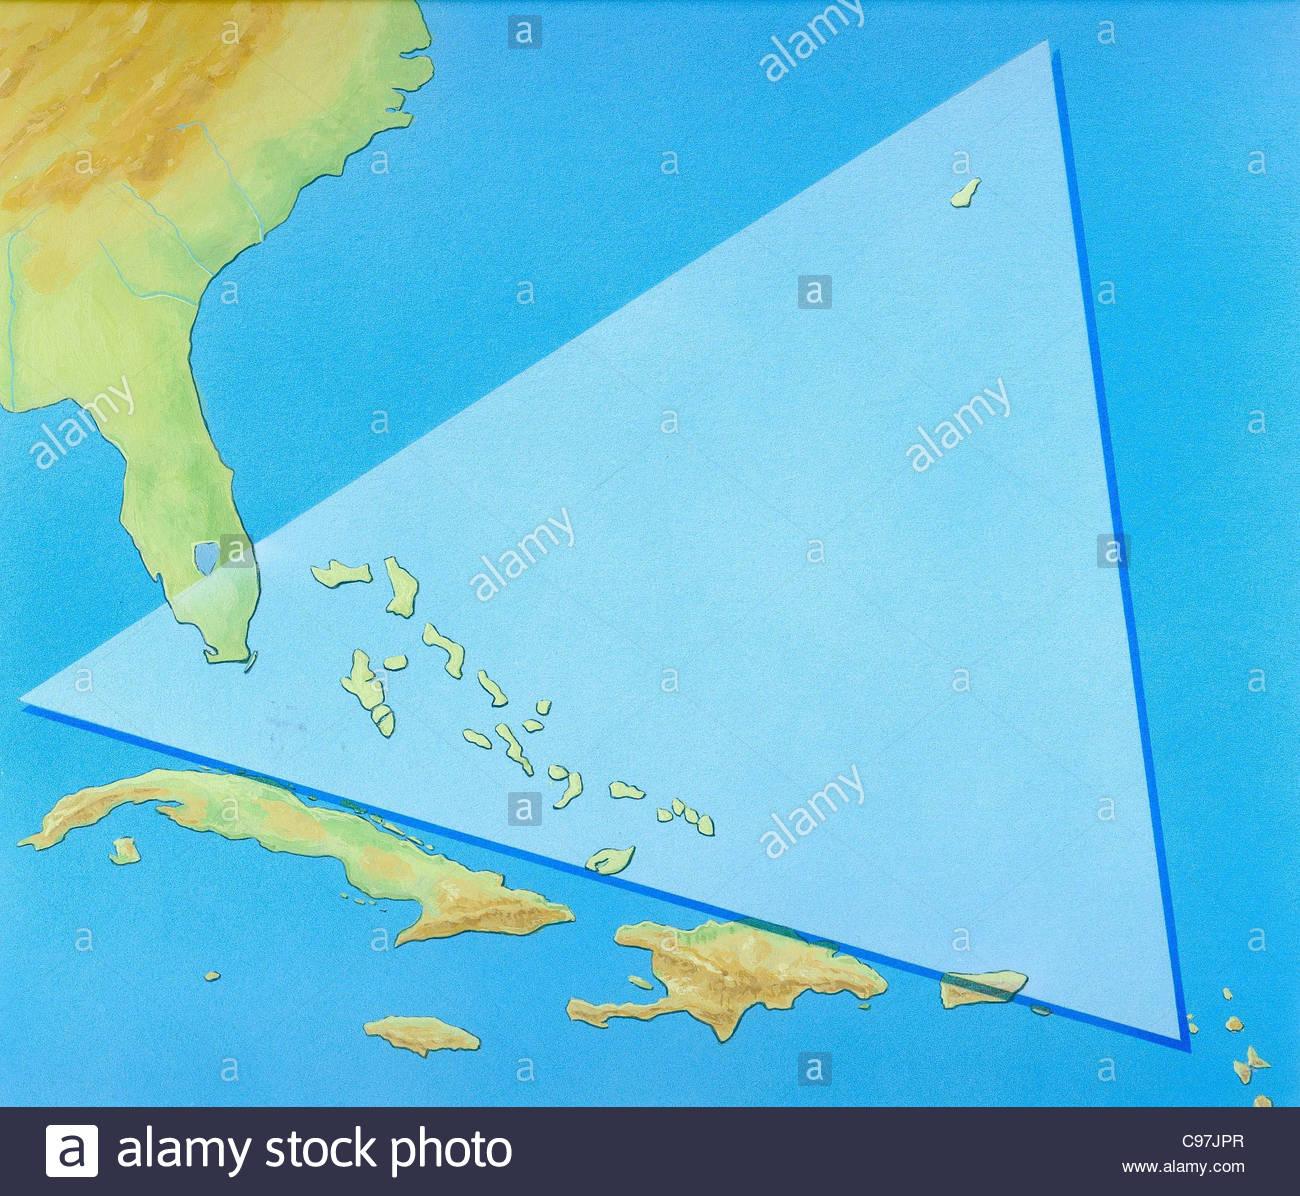 Bermuda Triangle Stock Photos & Bermuda Triangle Stock Images - Alamy